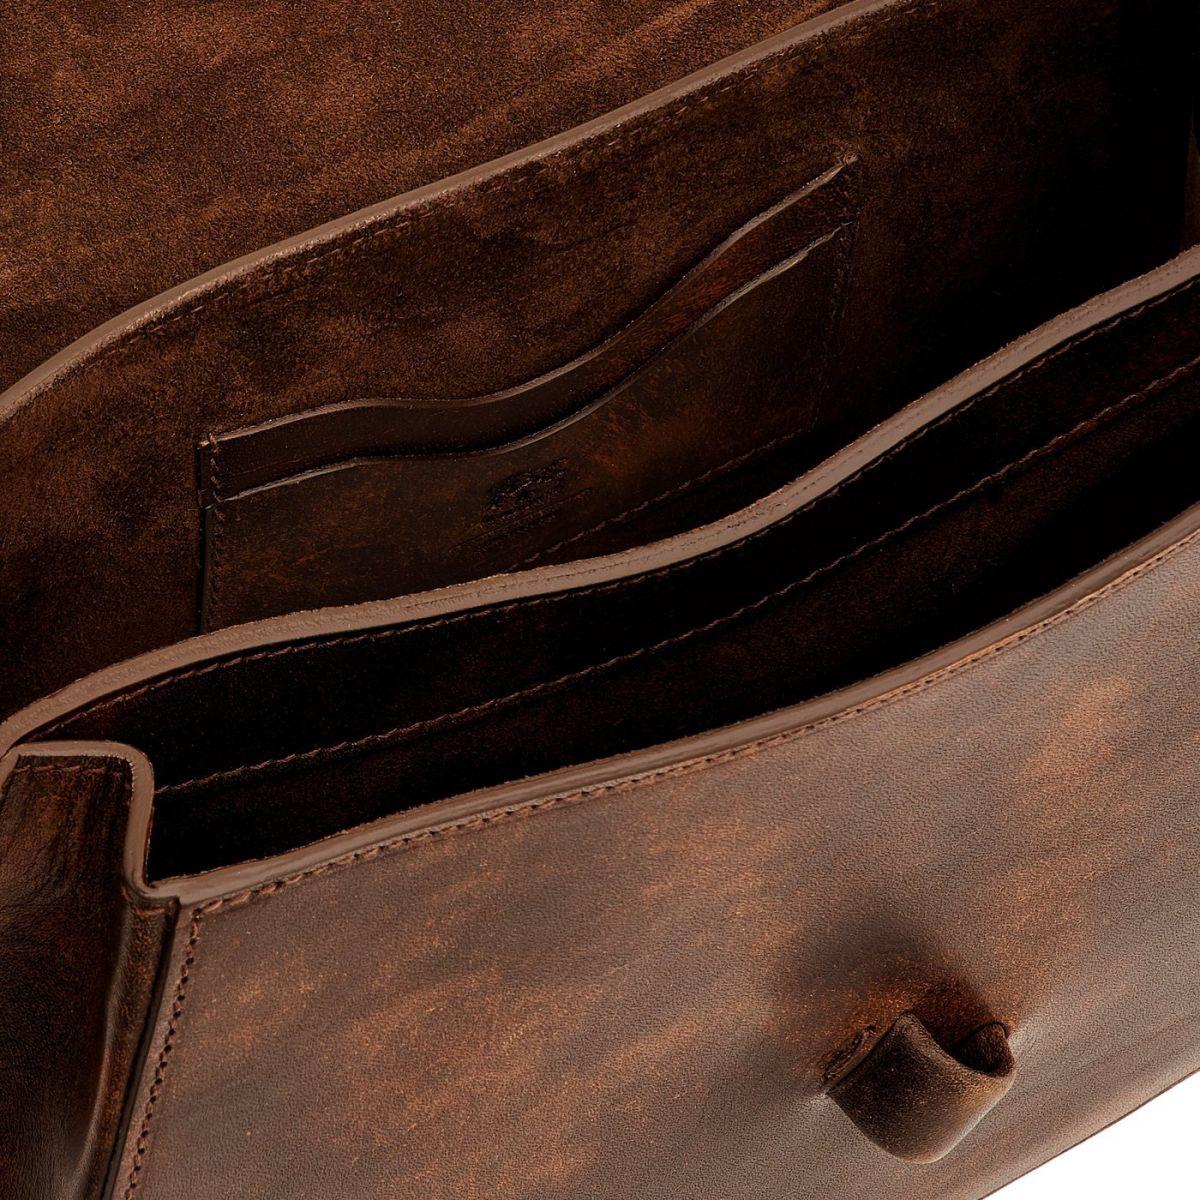 Women's Handbag  in Brushed Cowhide Leather BTH112 color Dark Brown   Details